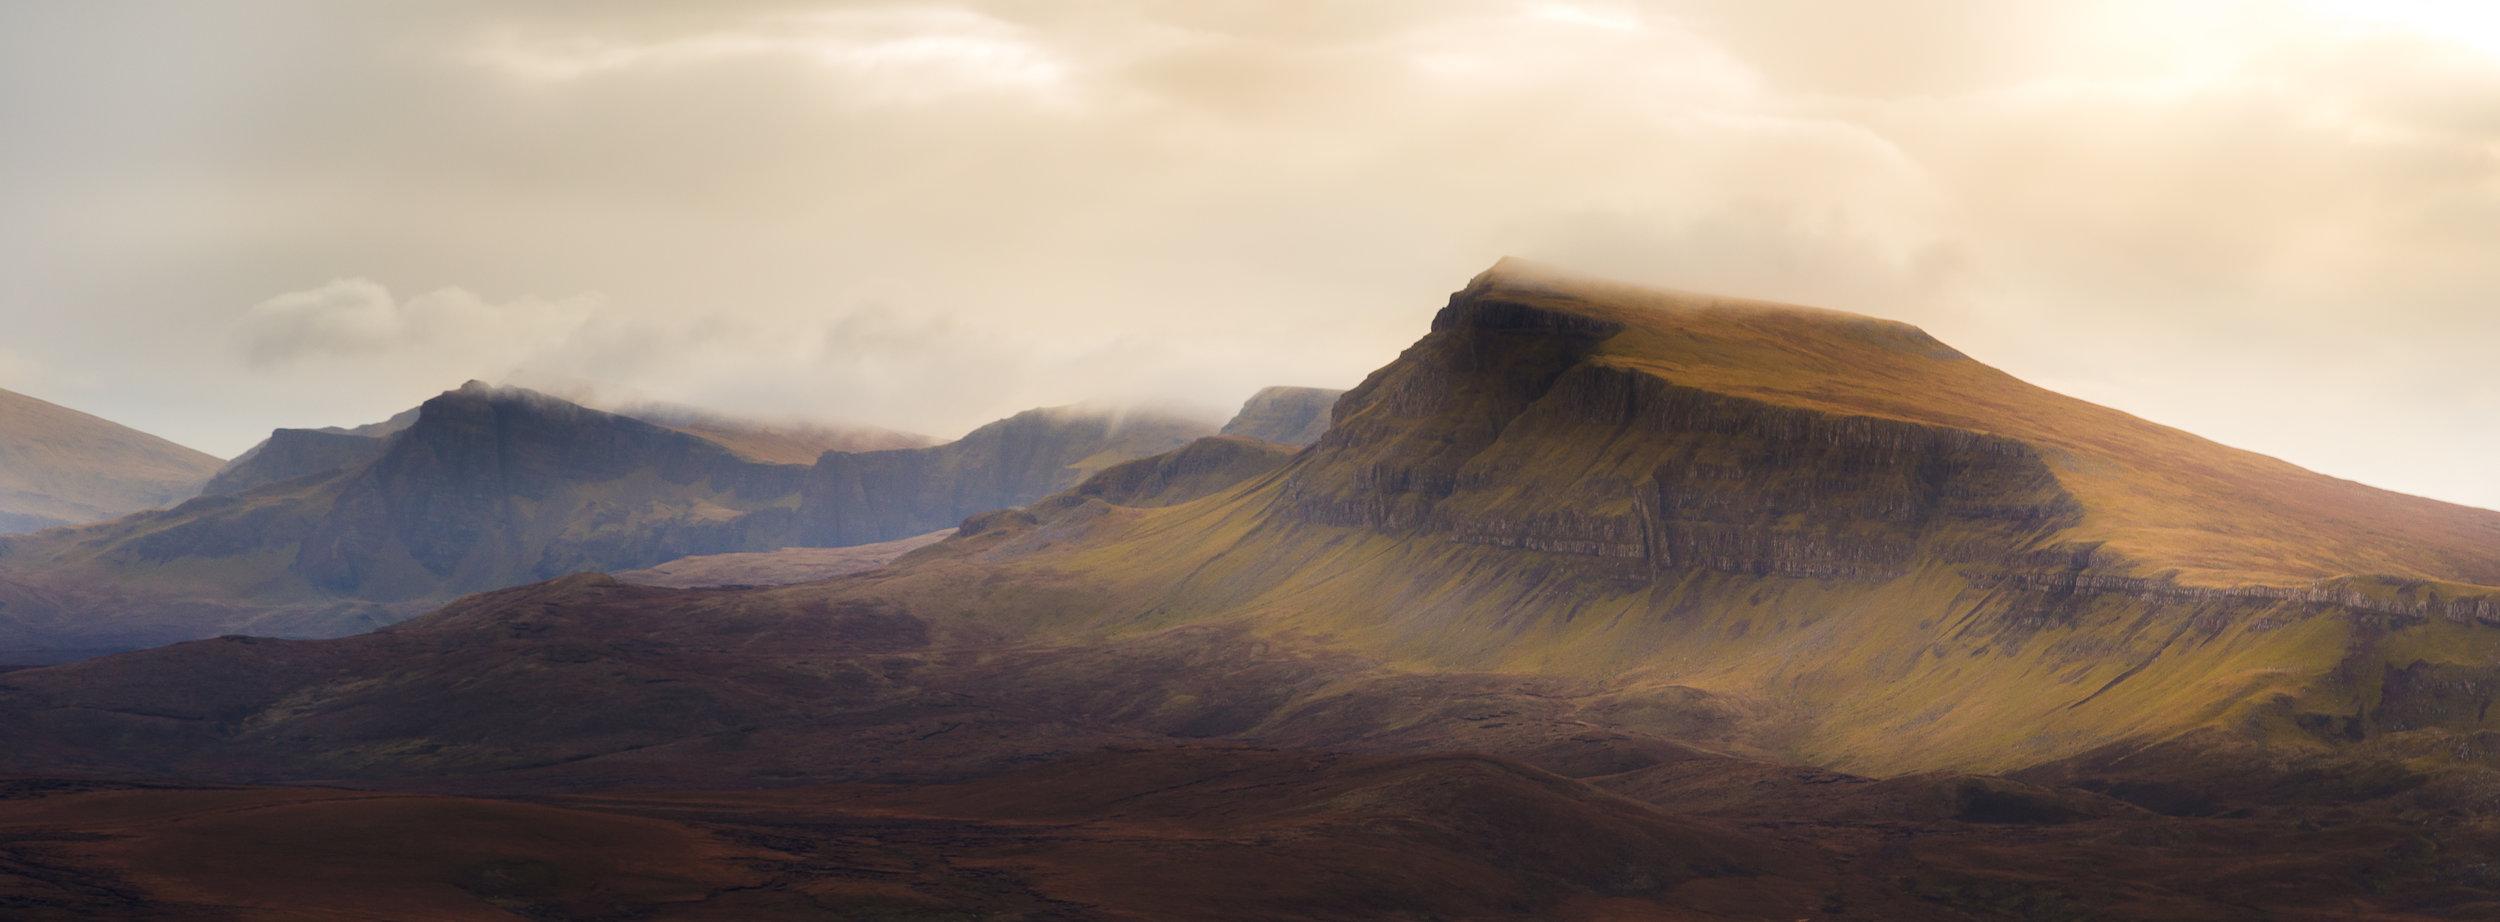 Scotland website-11.jpg